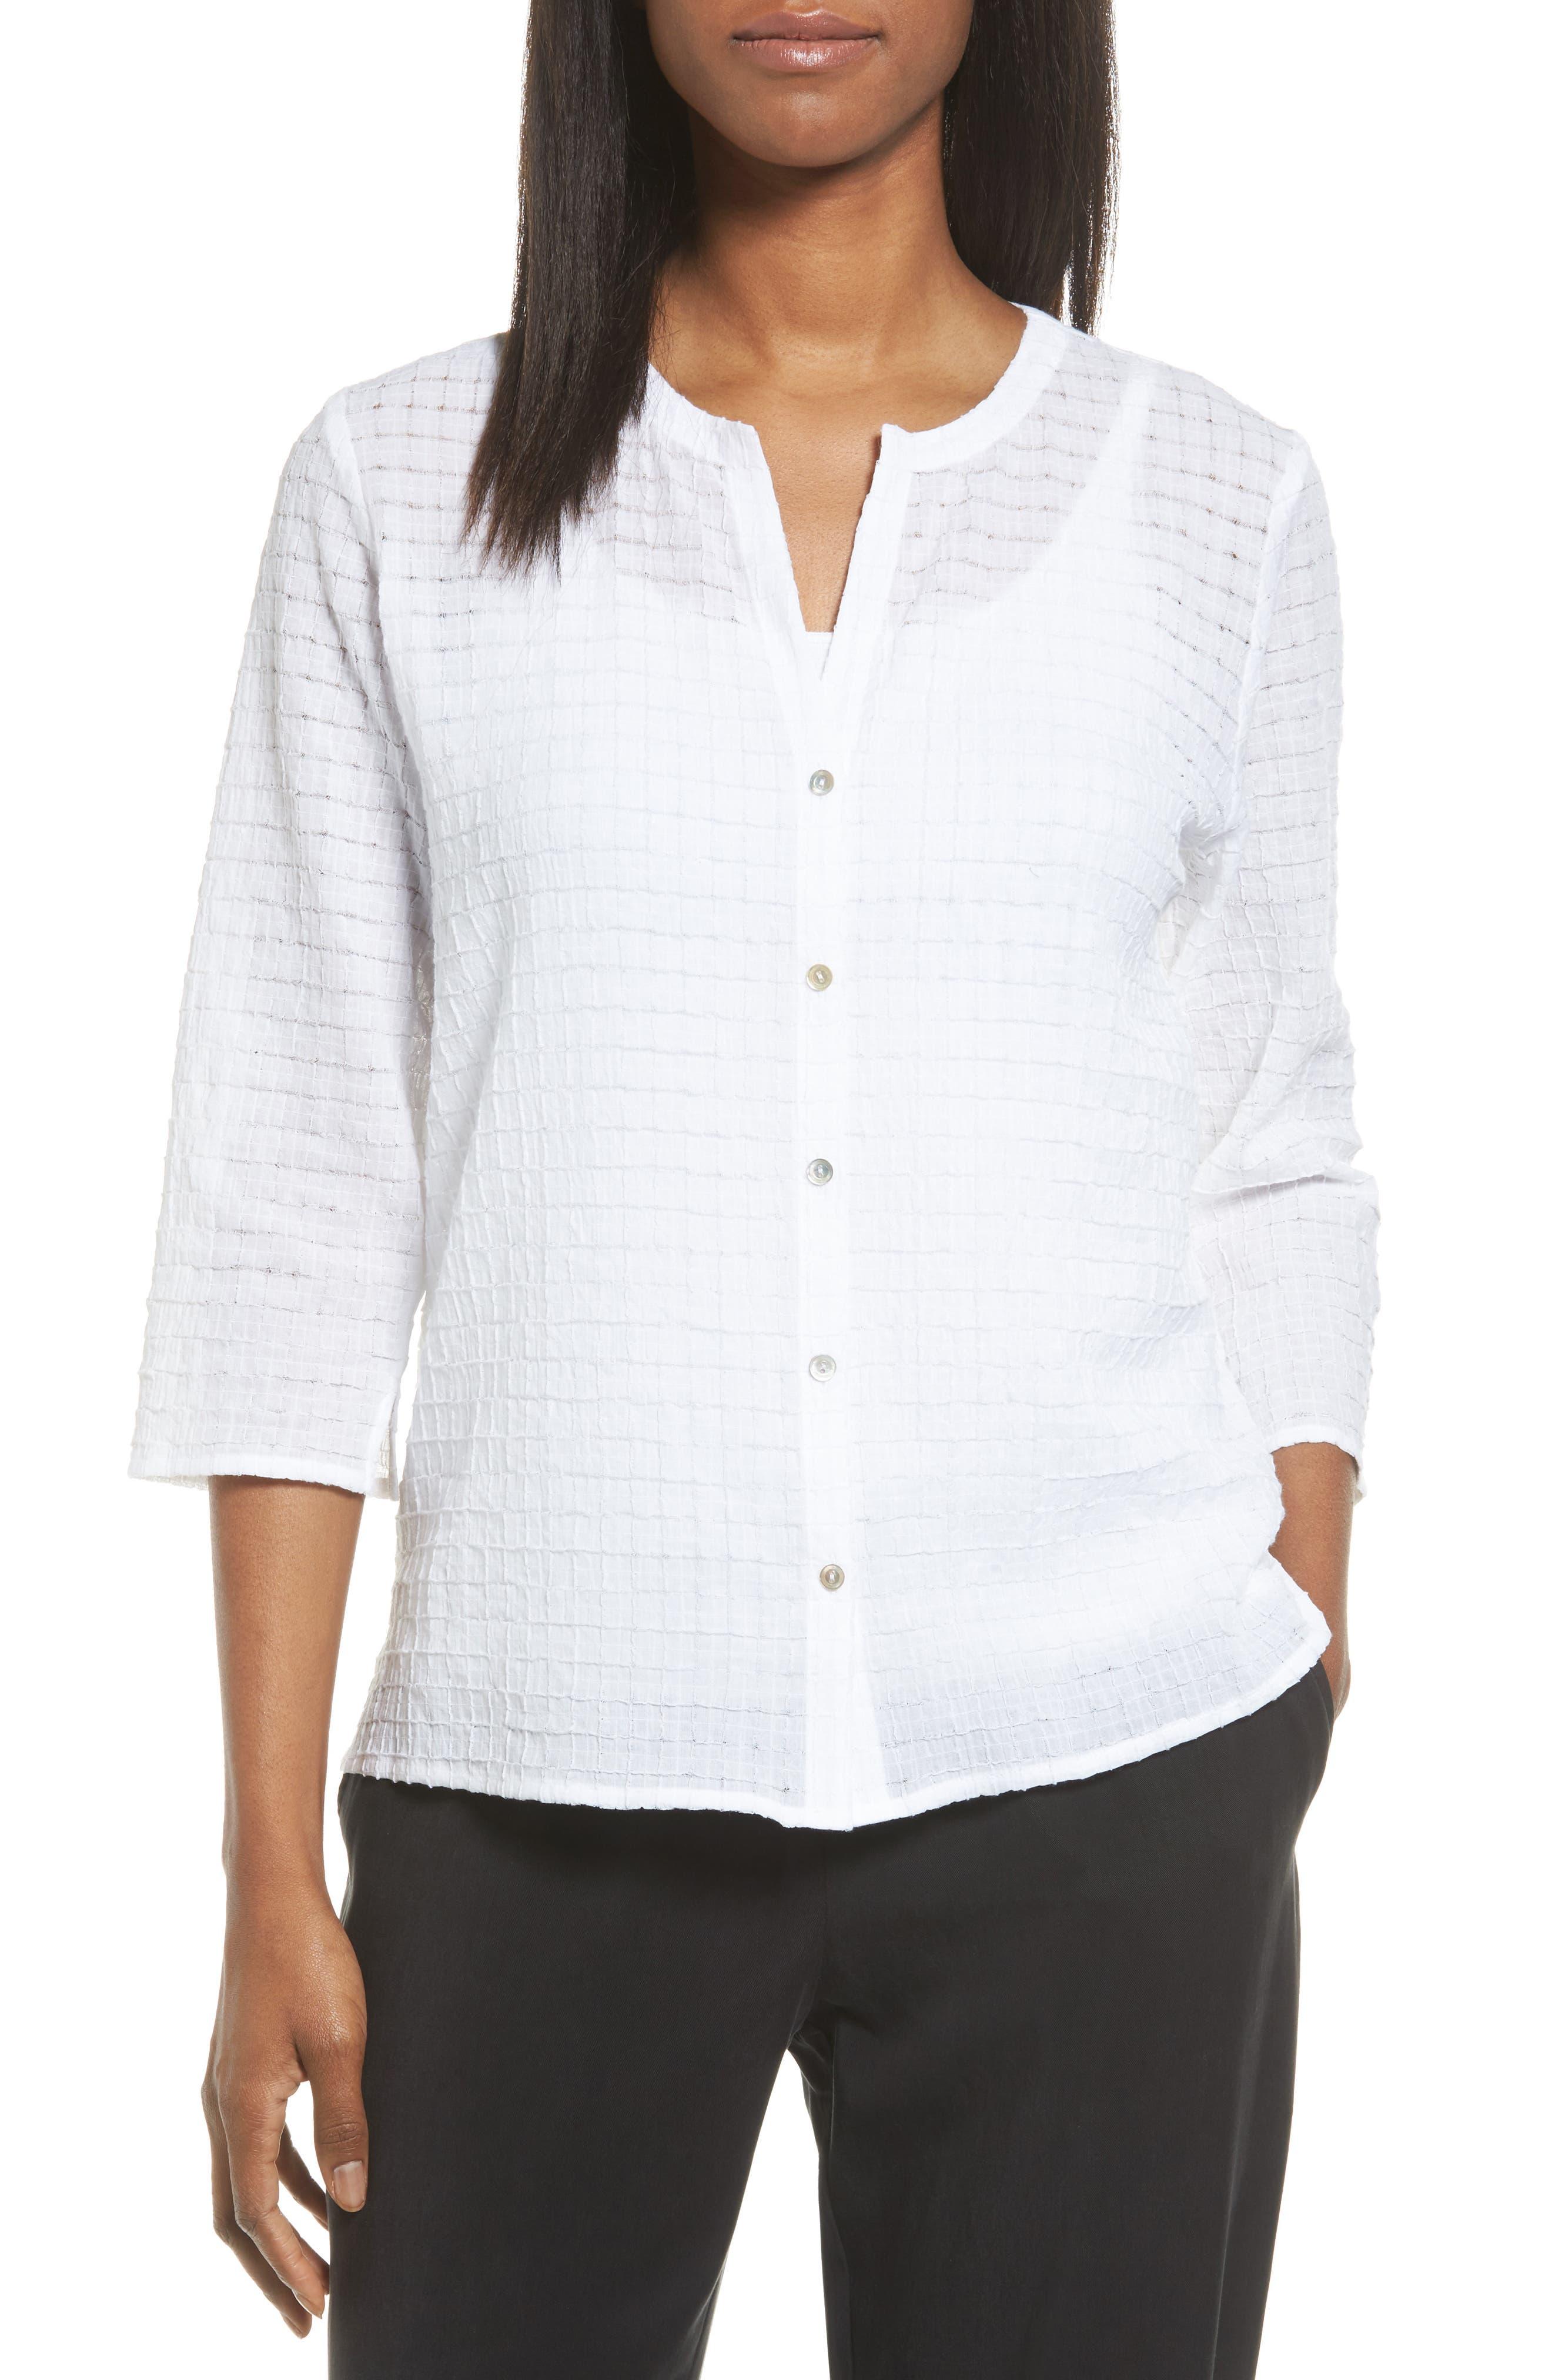 Eileen Fisher Check Textured Blouse (Regular & Petite)